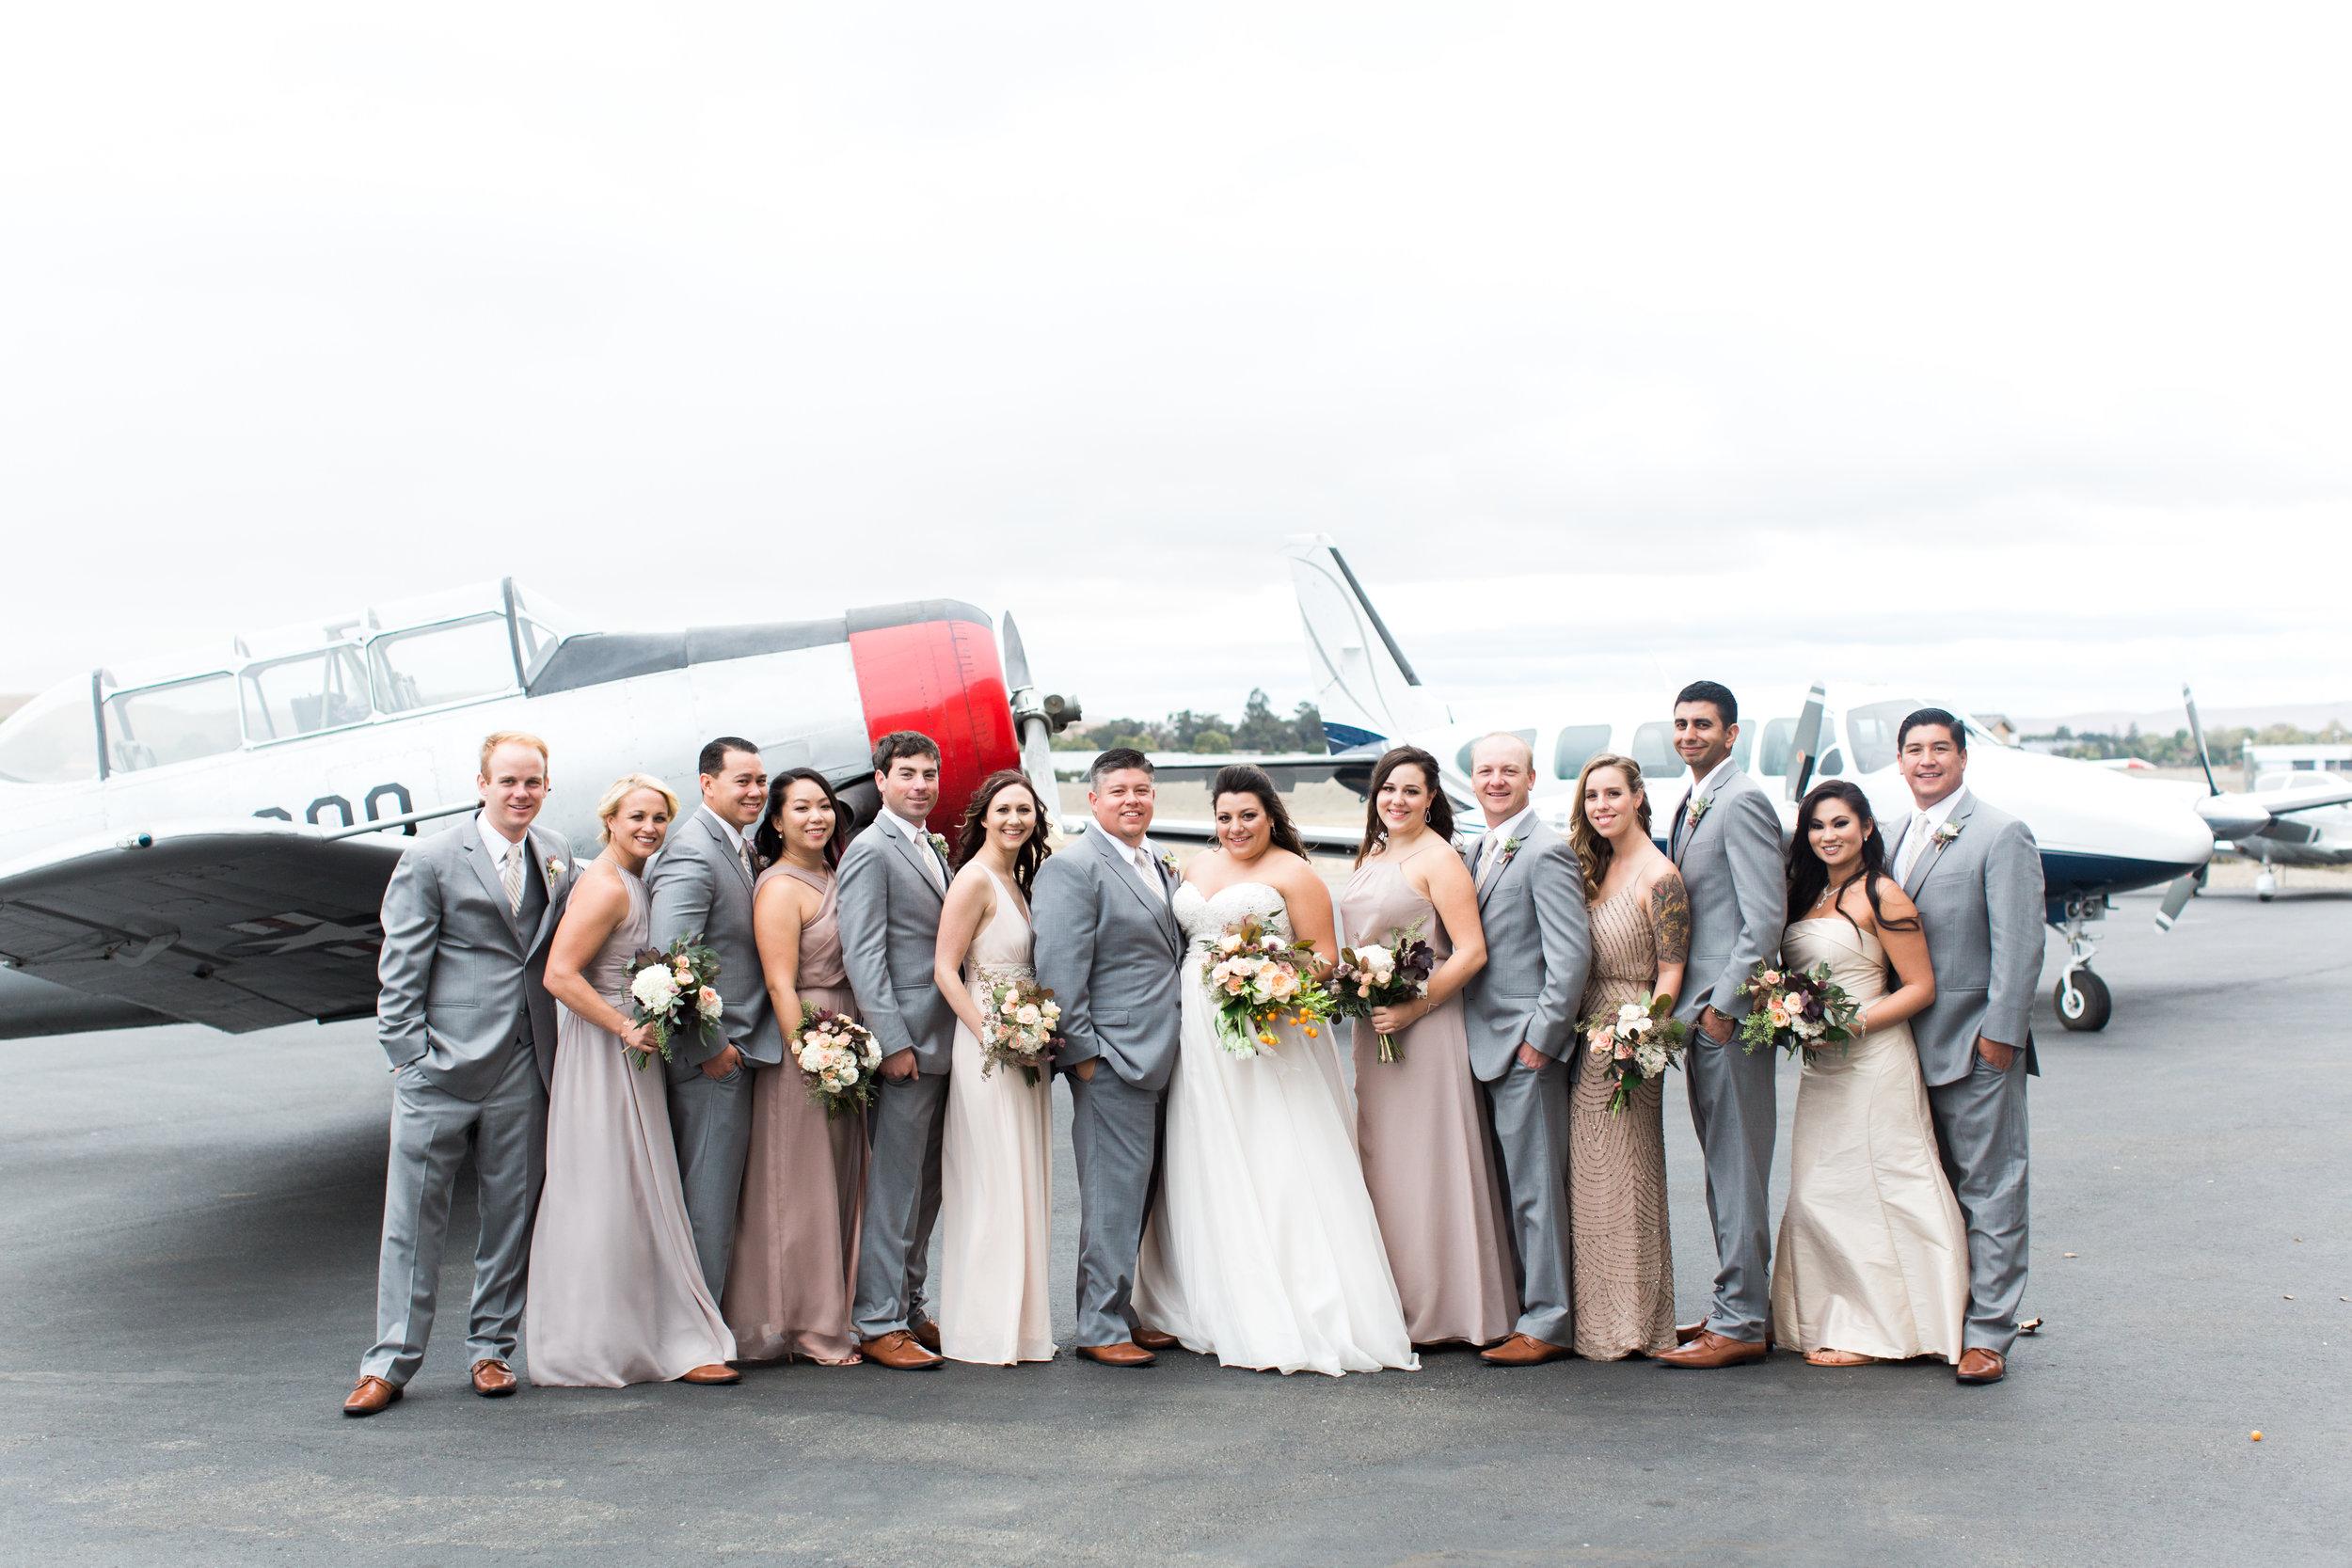 airport-hanger-wedding-at-attitude-aviation-in-livermore-71.jpg